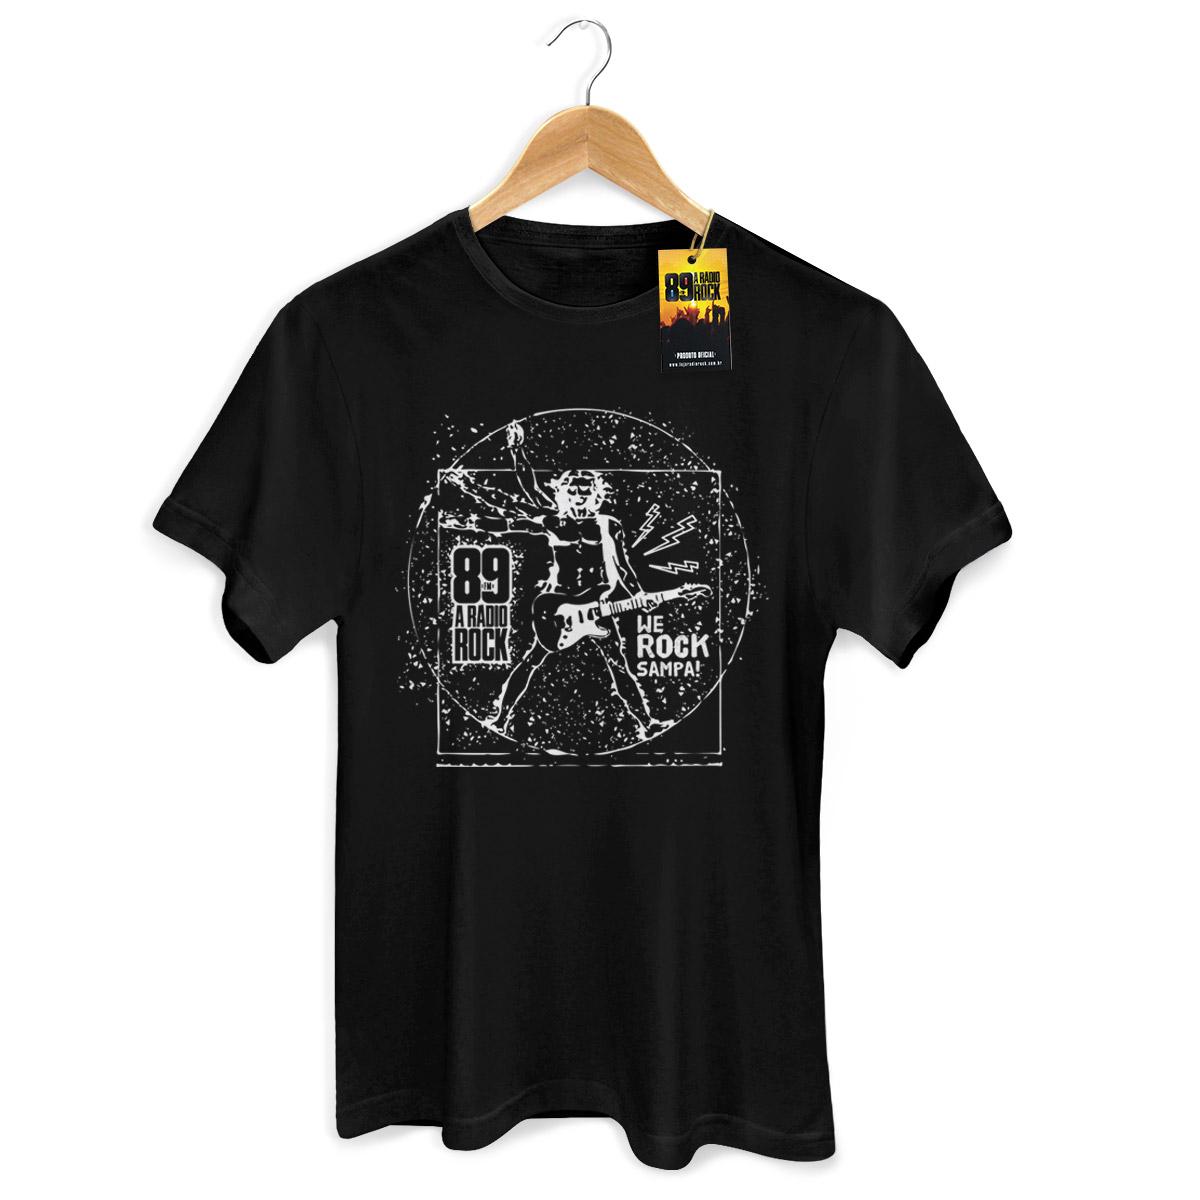 Camiseta Masculina 89 FM A Rádio Rock We Rock Vitrúvio! 2